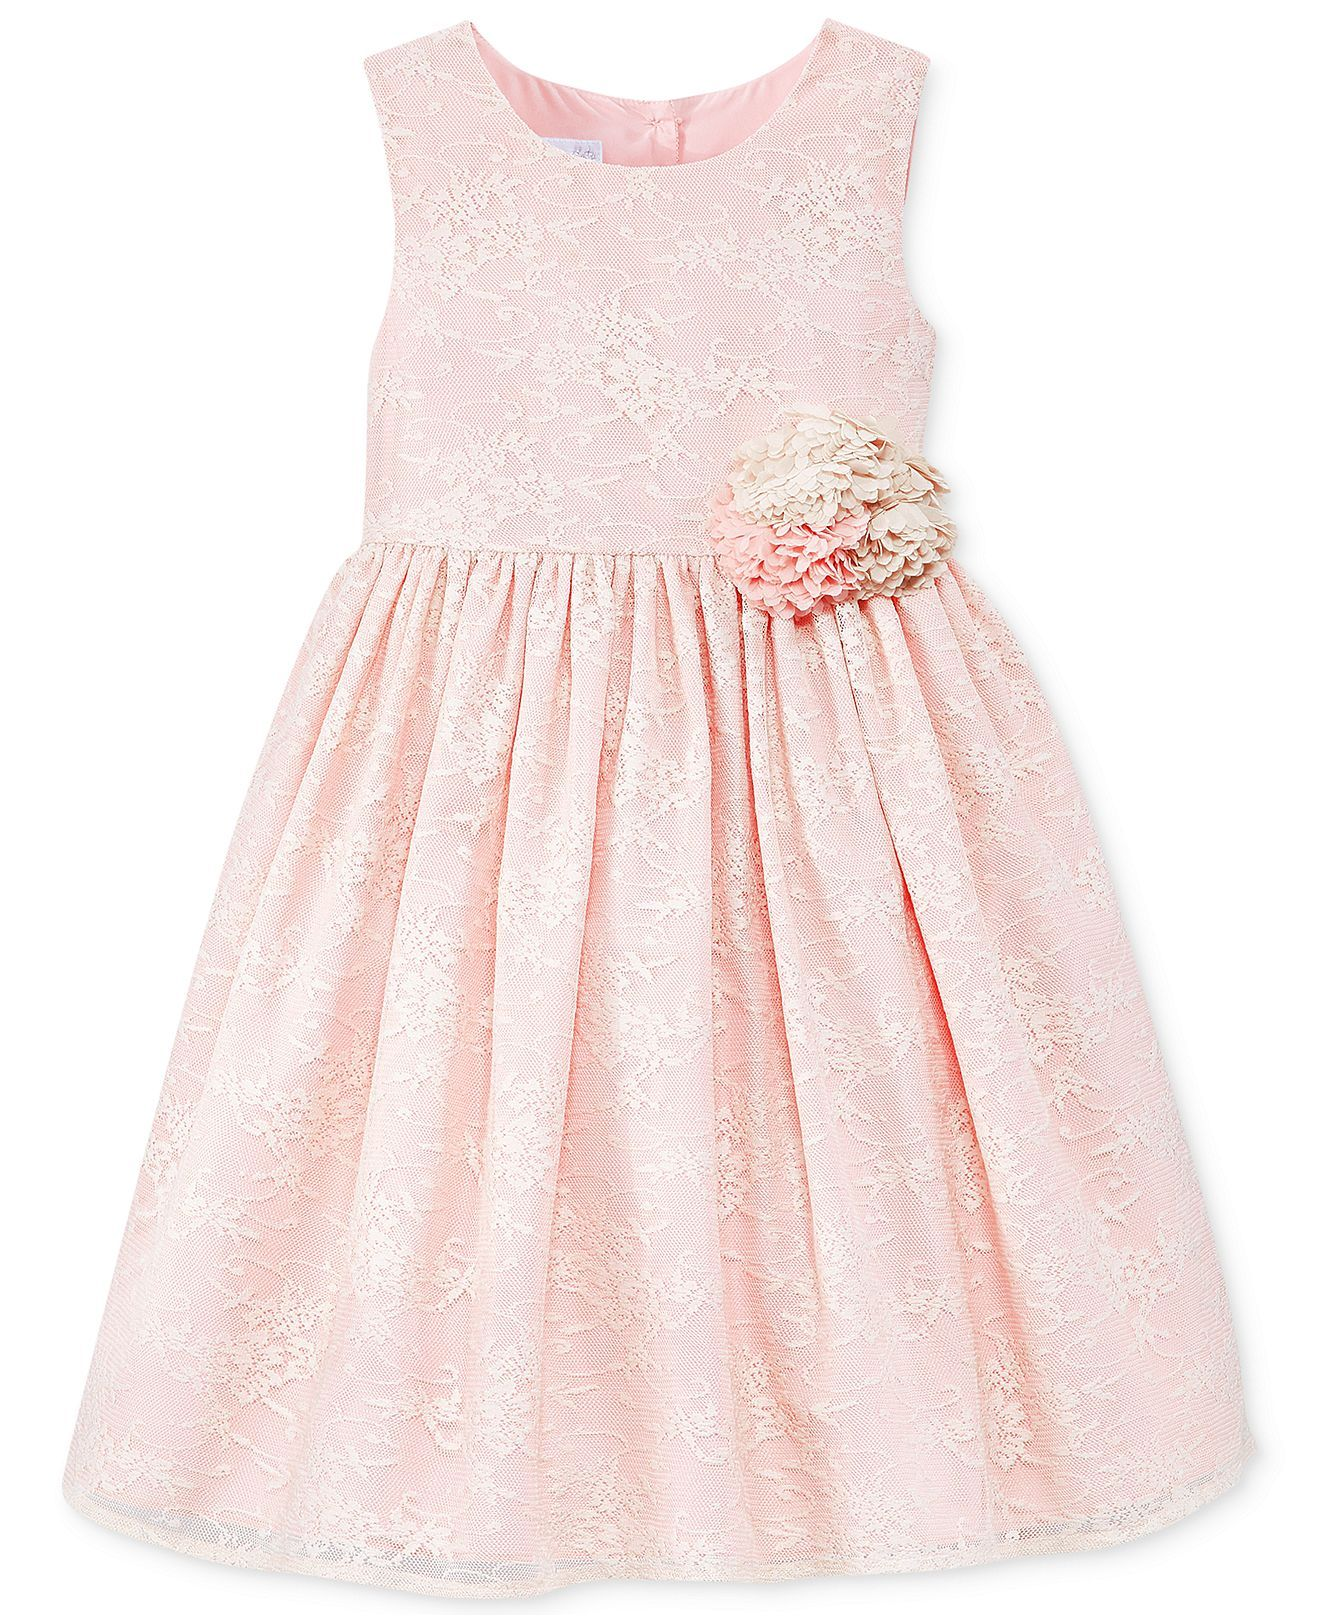 Marmellata Little Girls Pink Lace Dress Kids Macy s